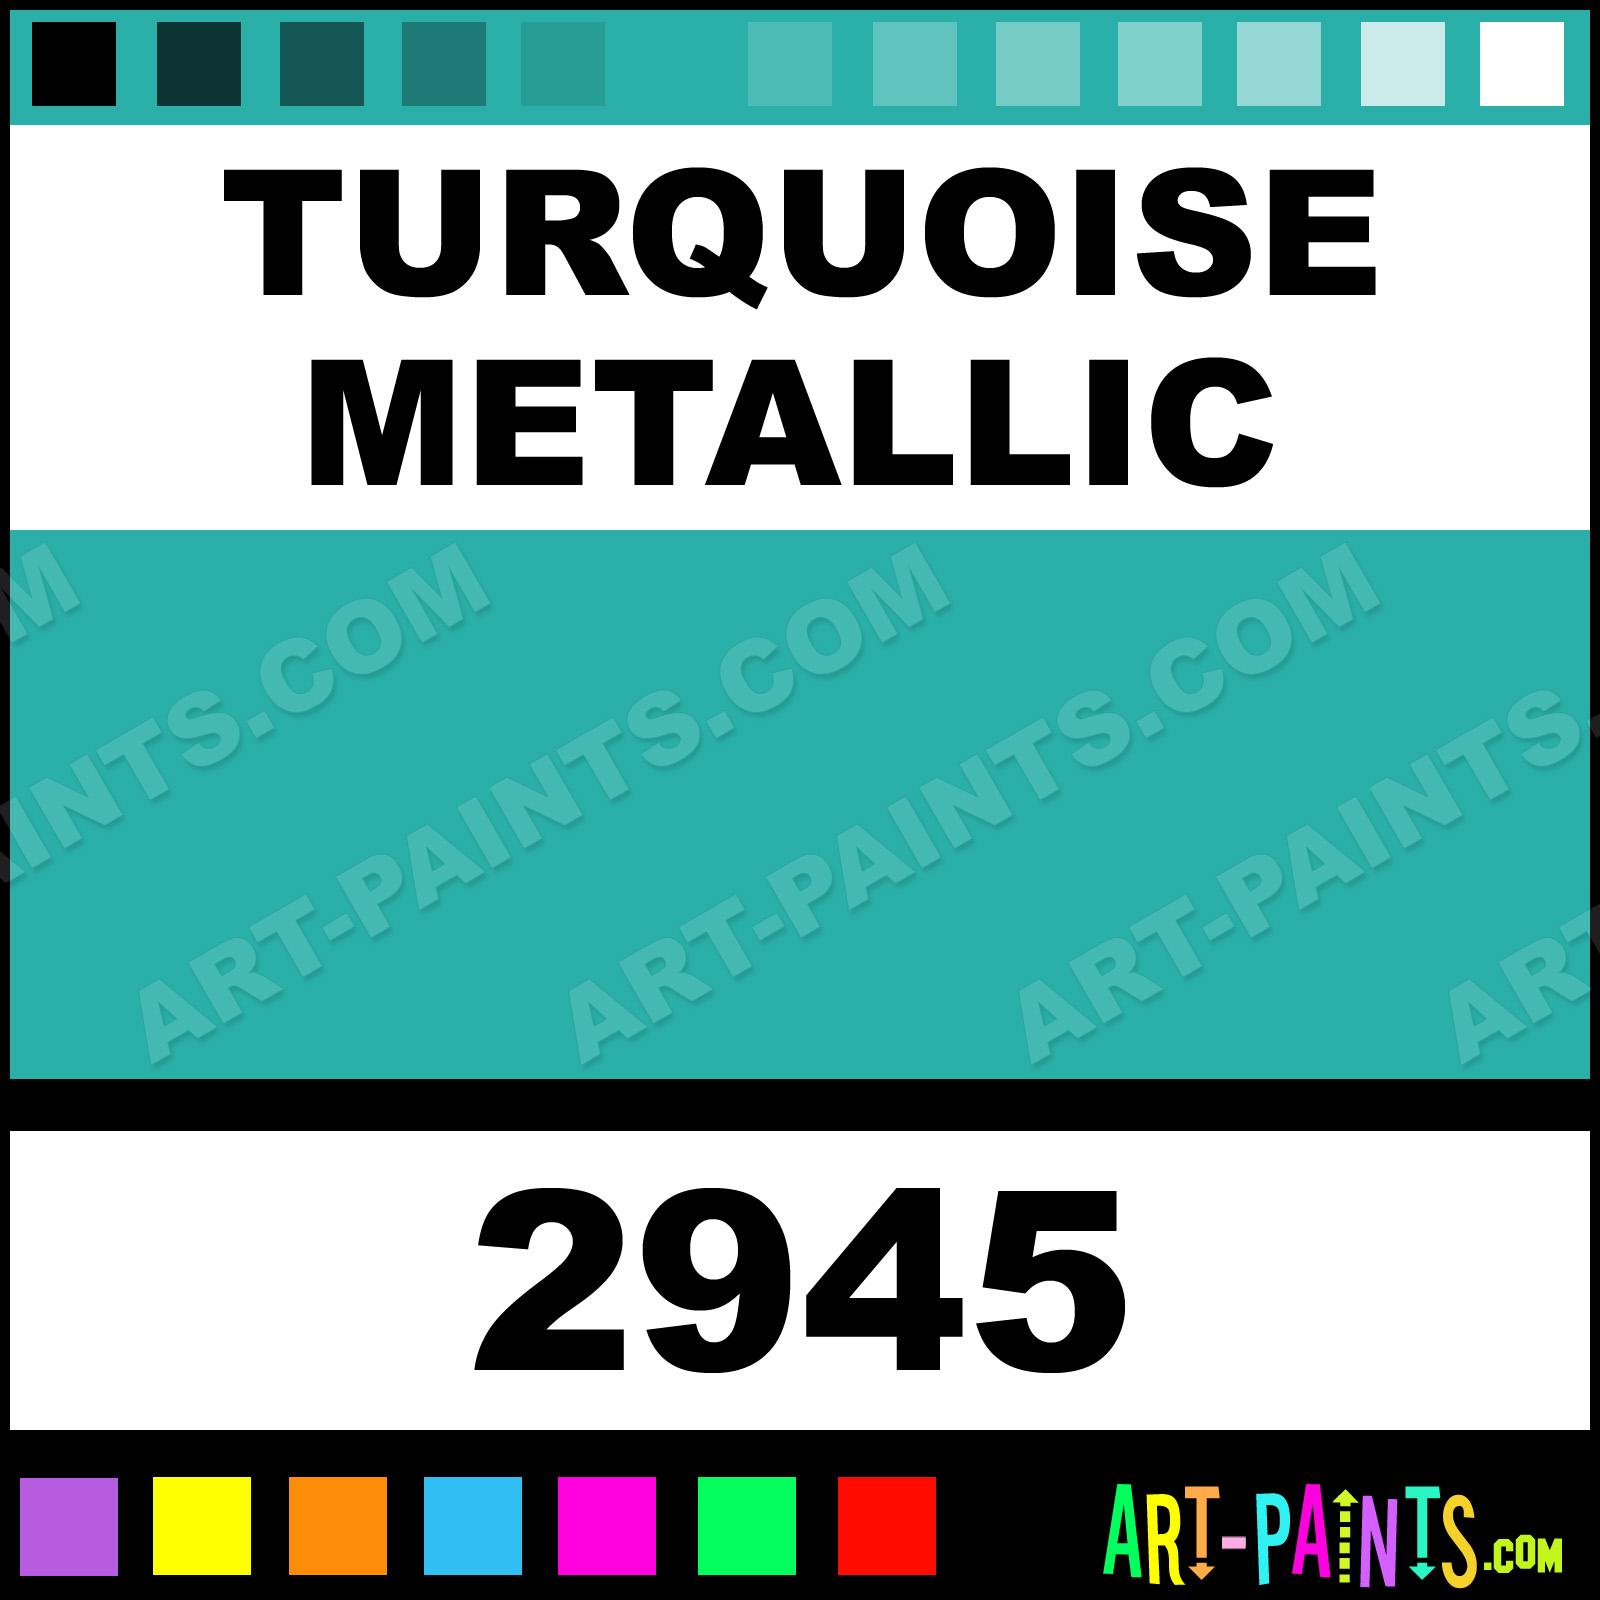 Green car paint colors - Turquoise Metallic Turquoise Metallic Paint